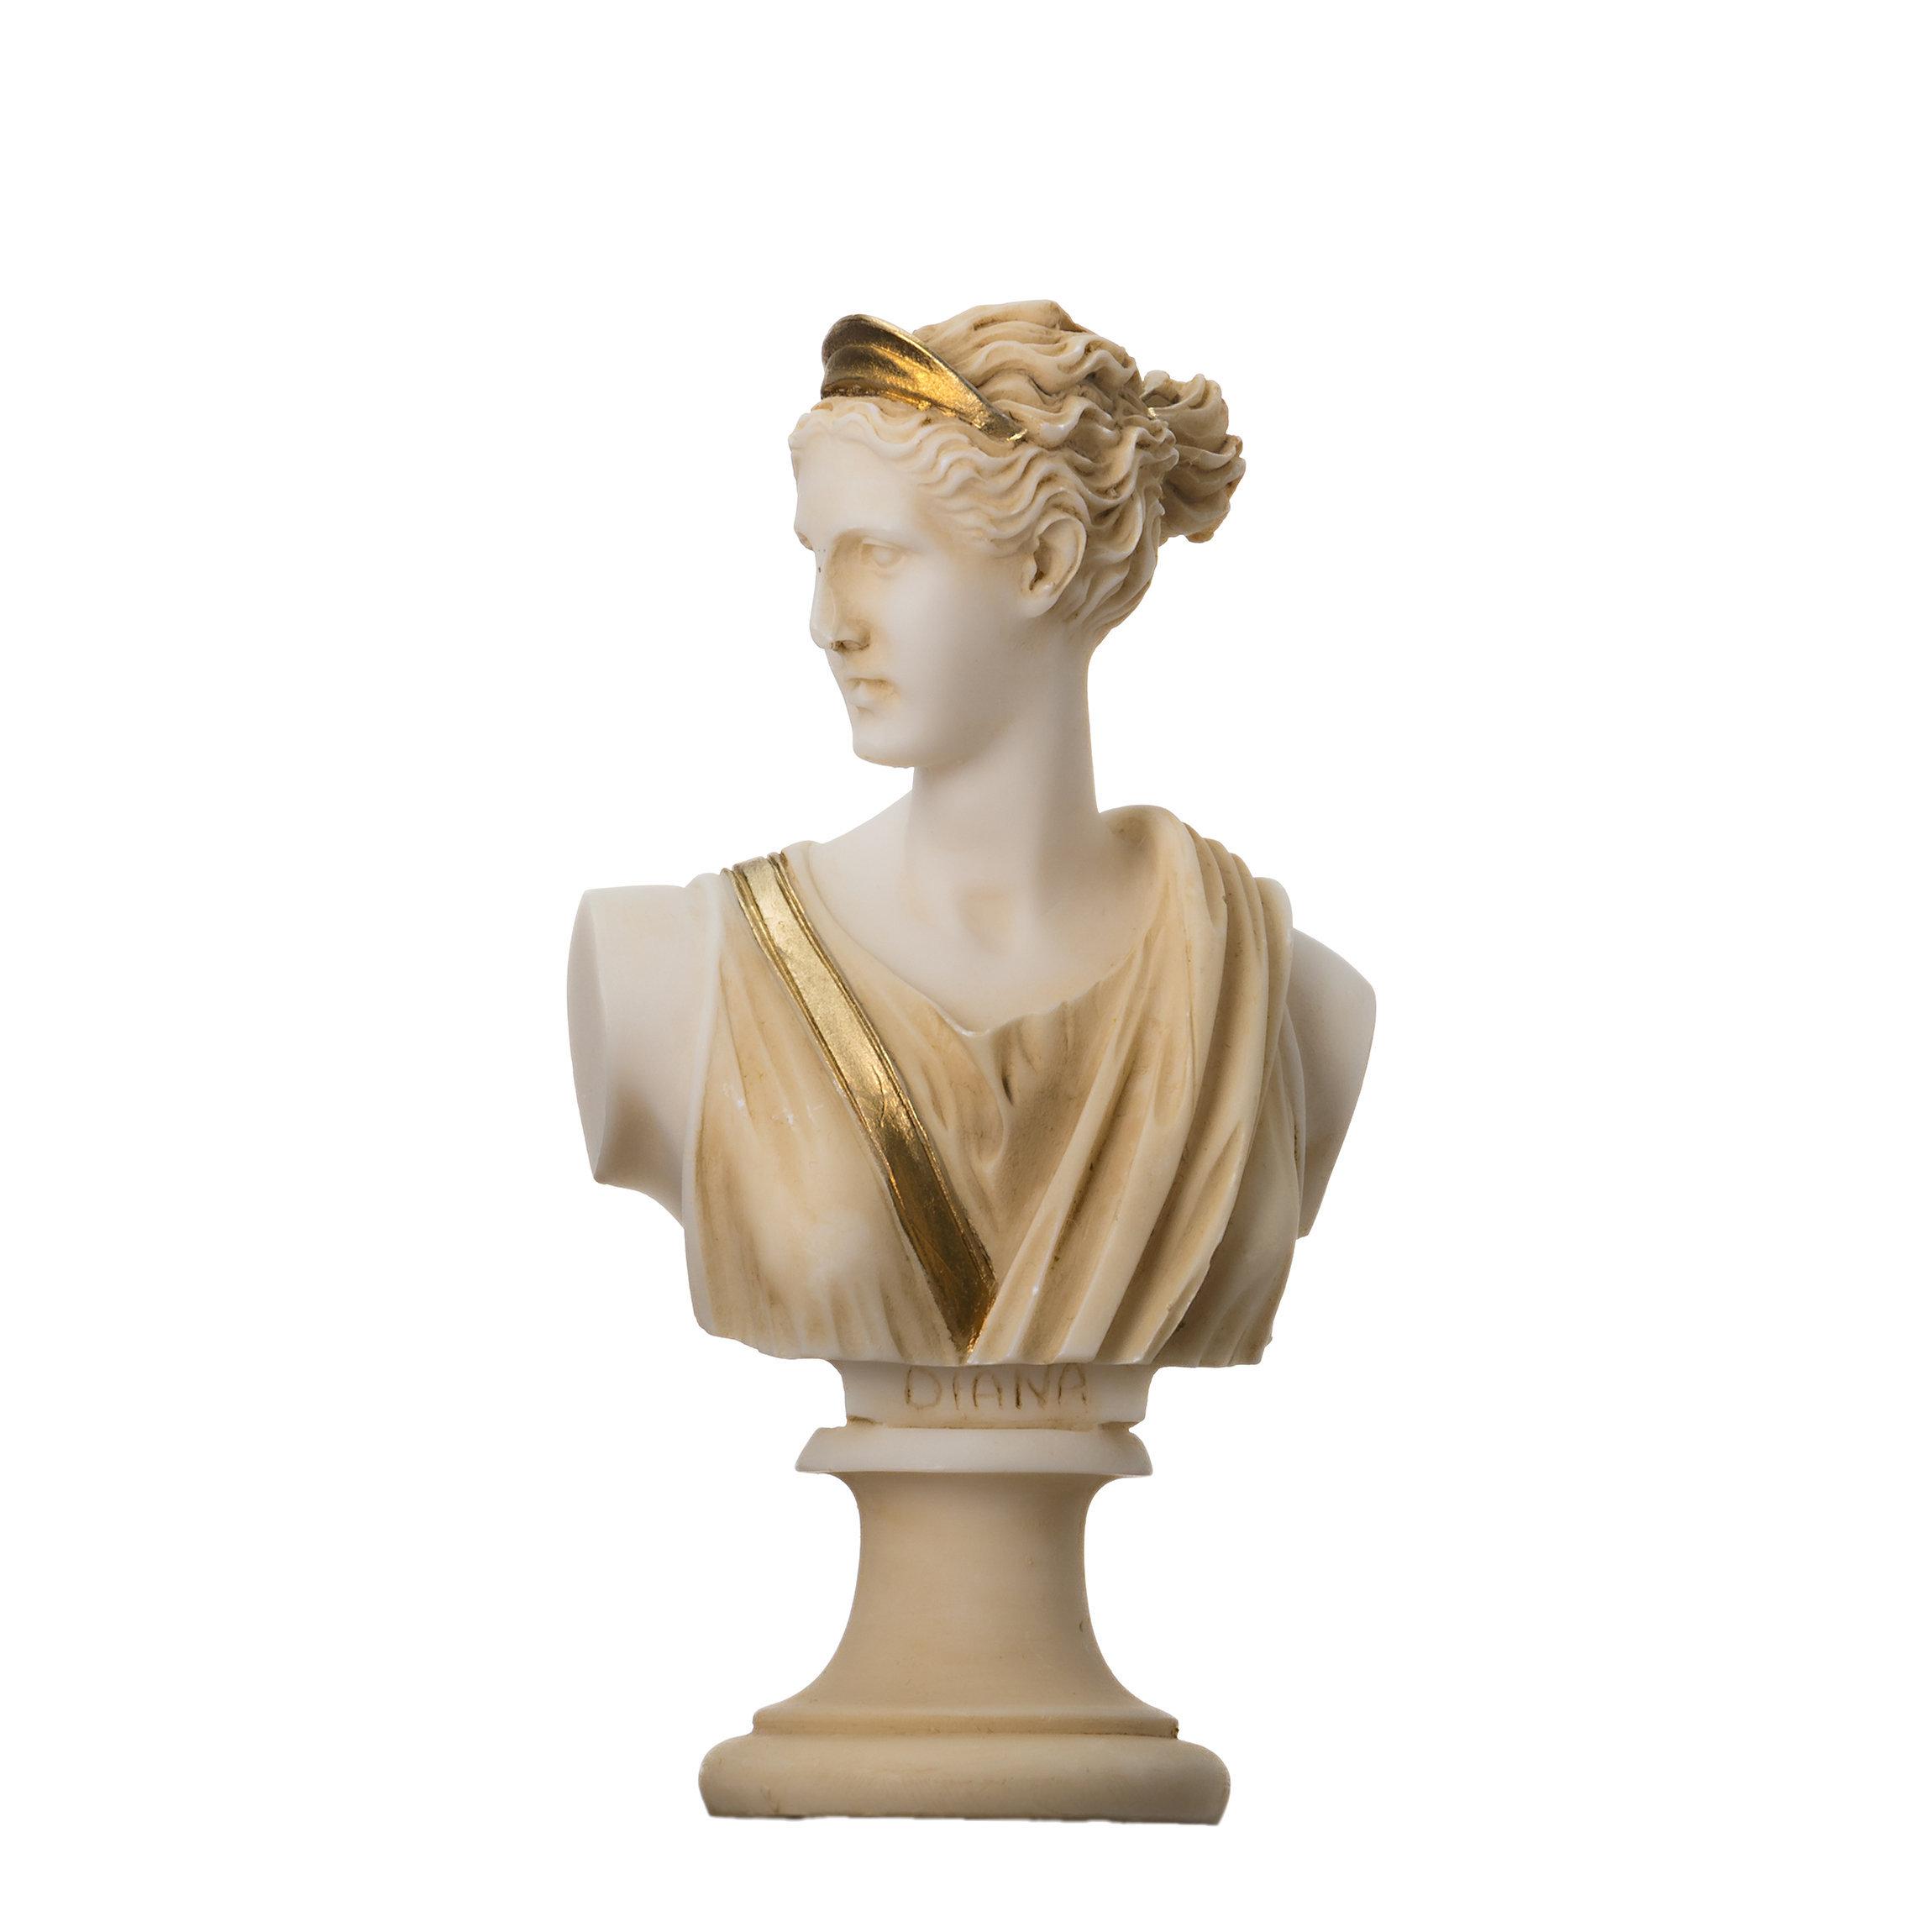 Artemis Diana Bust Greek Statue Nature Moon Goddess Gold Tone 5.9''